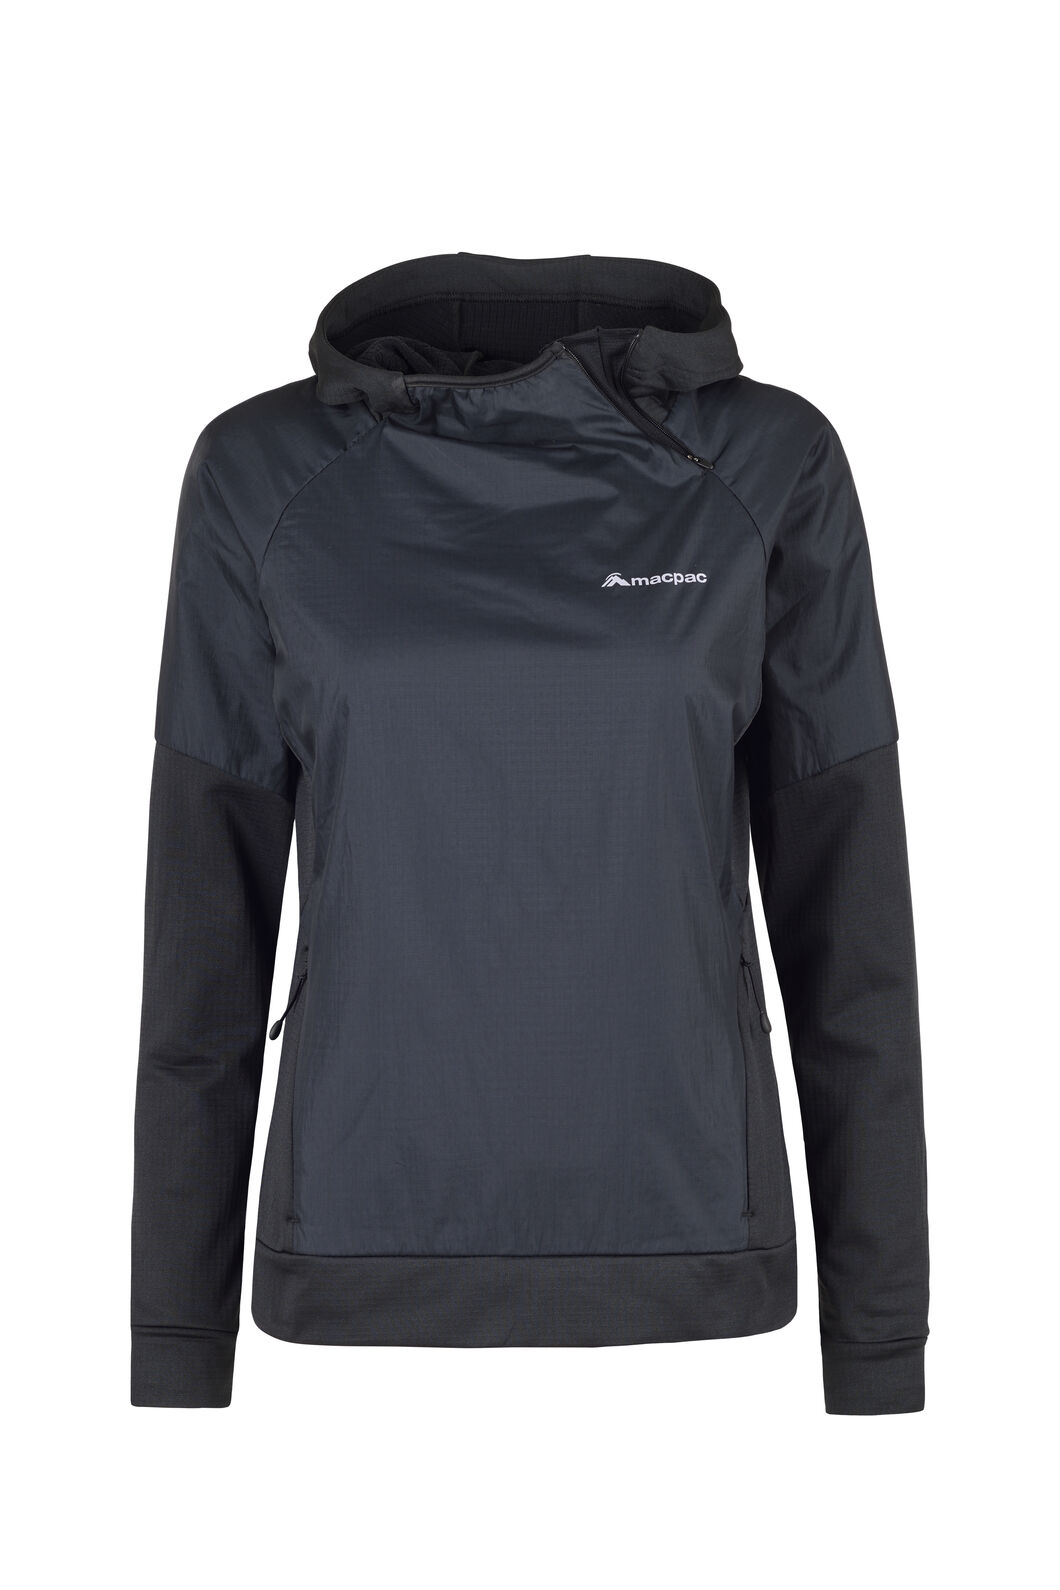 Macpac Saros Polartec® Alpha® Pullover - Women's, Black, hi-res